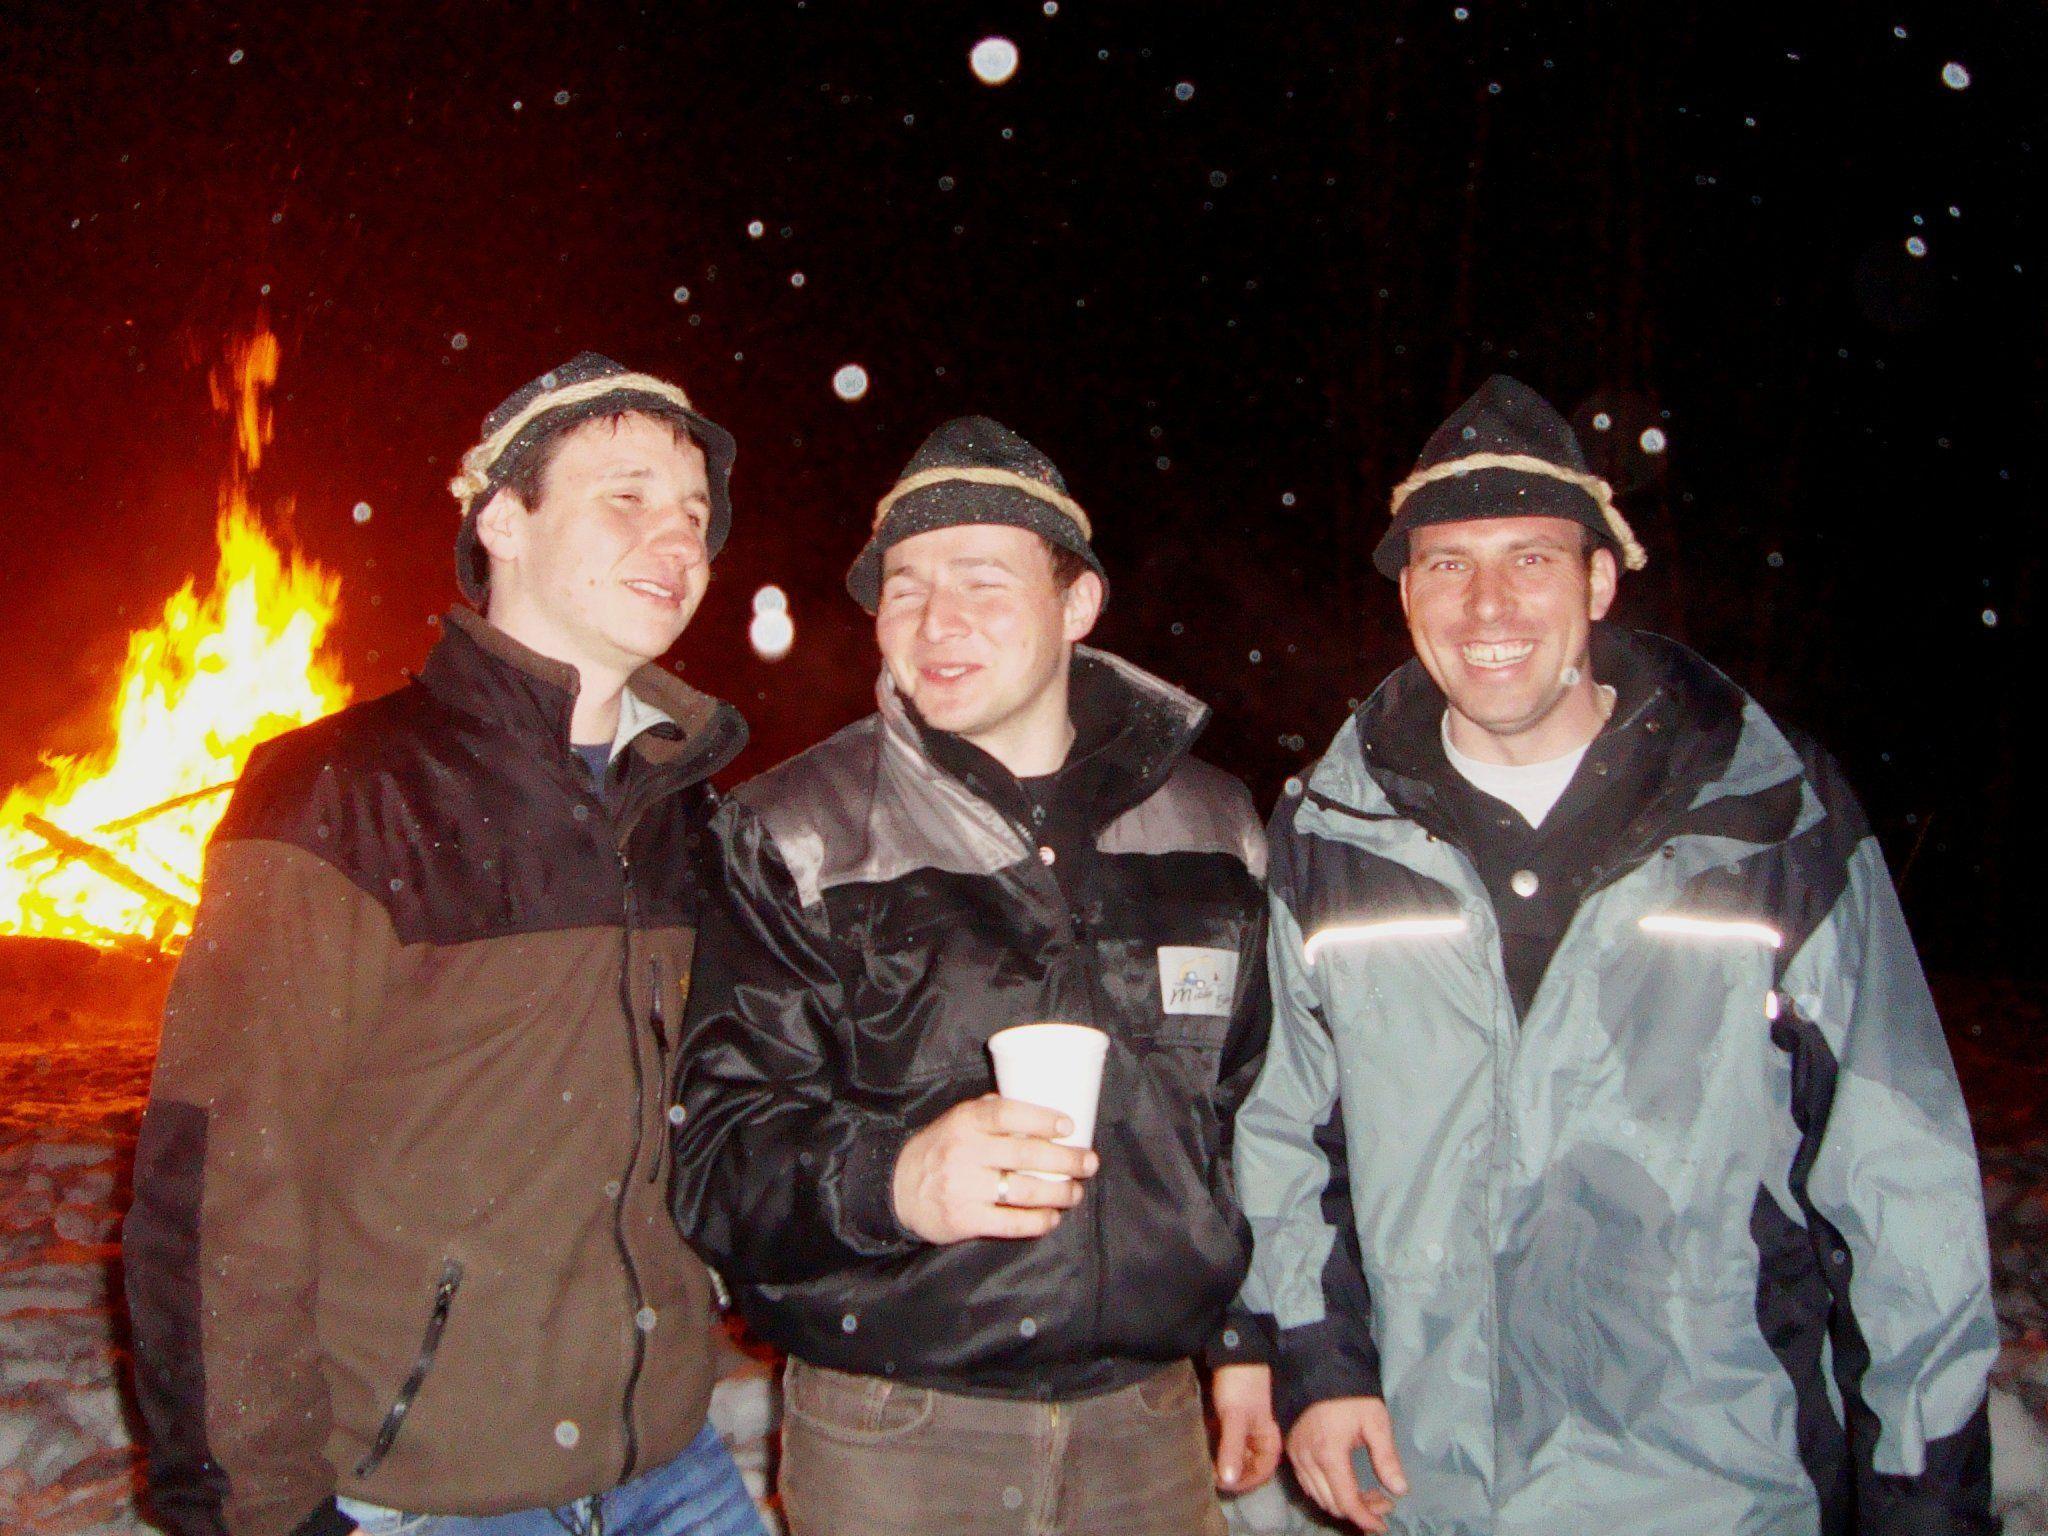 Jodok Rüf, Martin Metzler und Daniel Meusburger